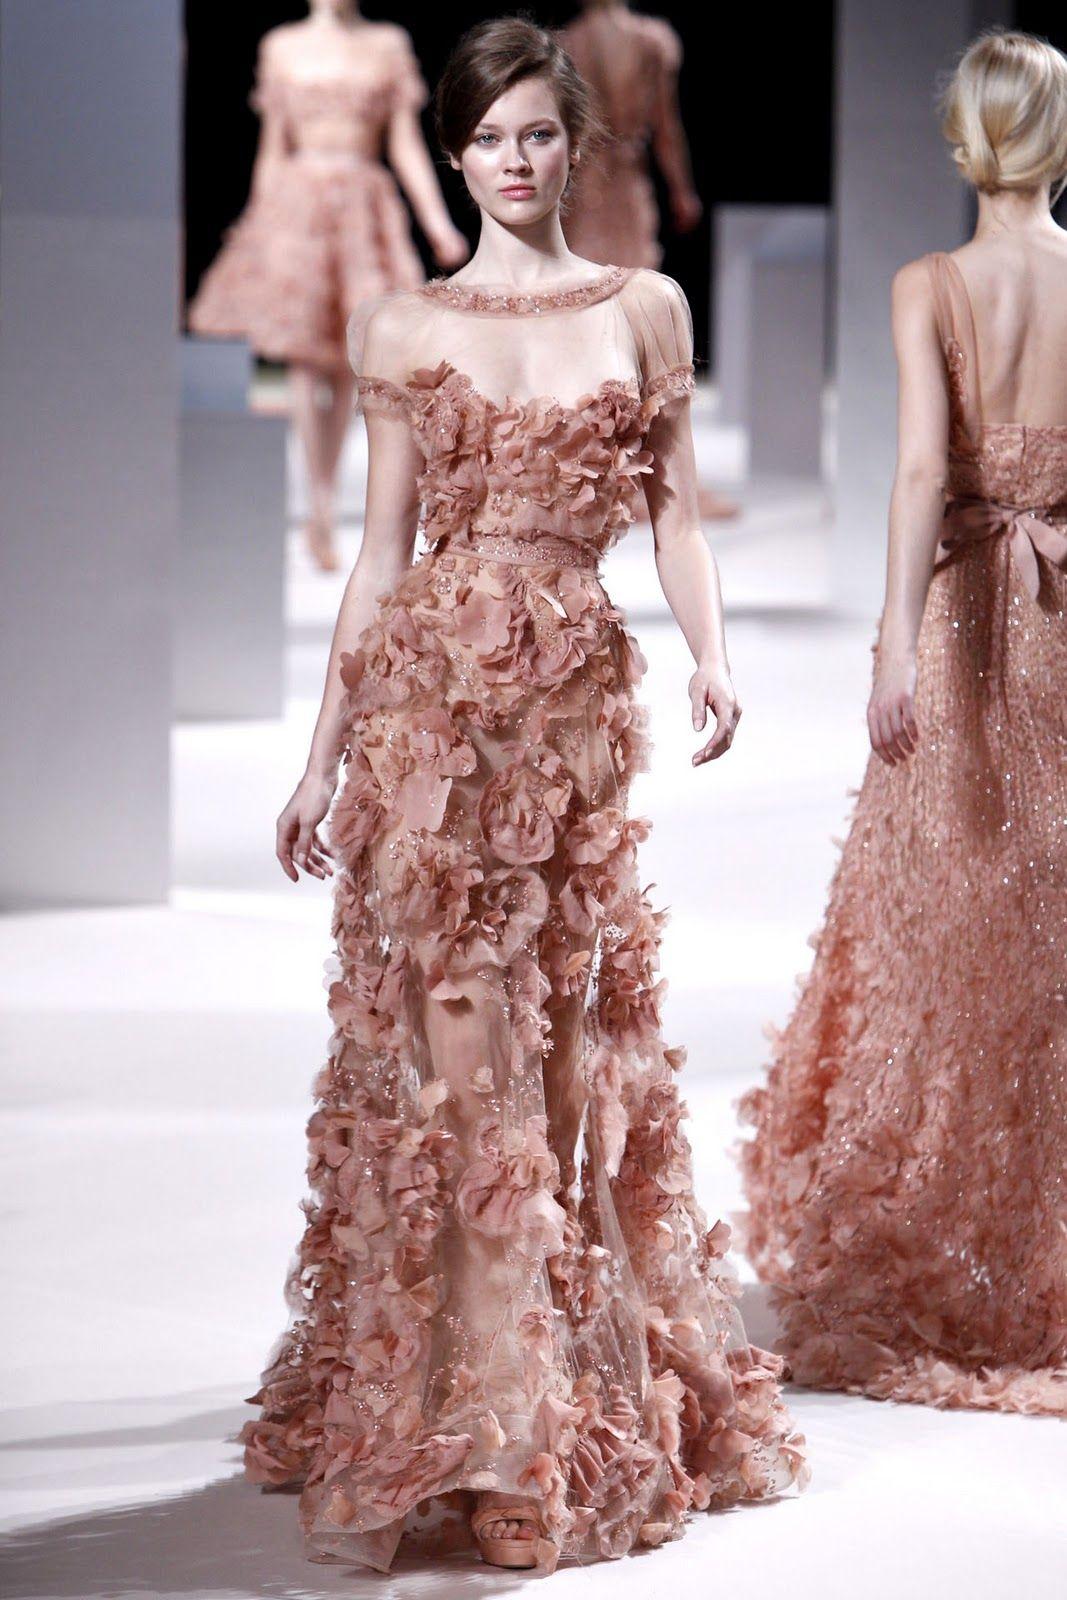 Champagne & Macarons: Paris Spring Couture ~ Elie Saab | Tus \